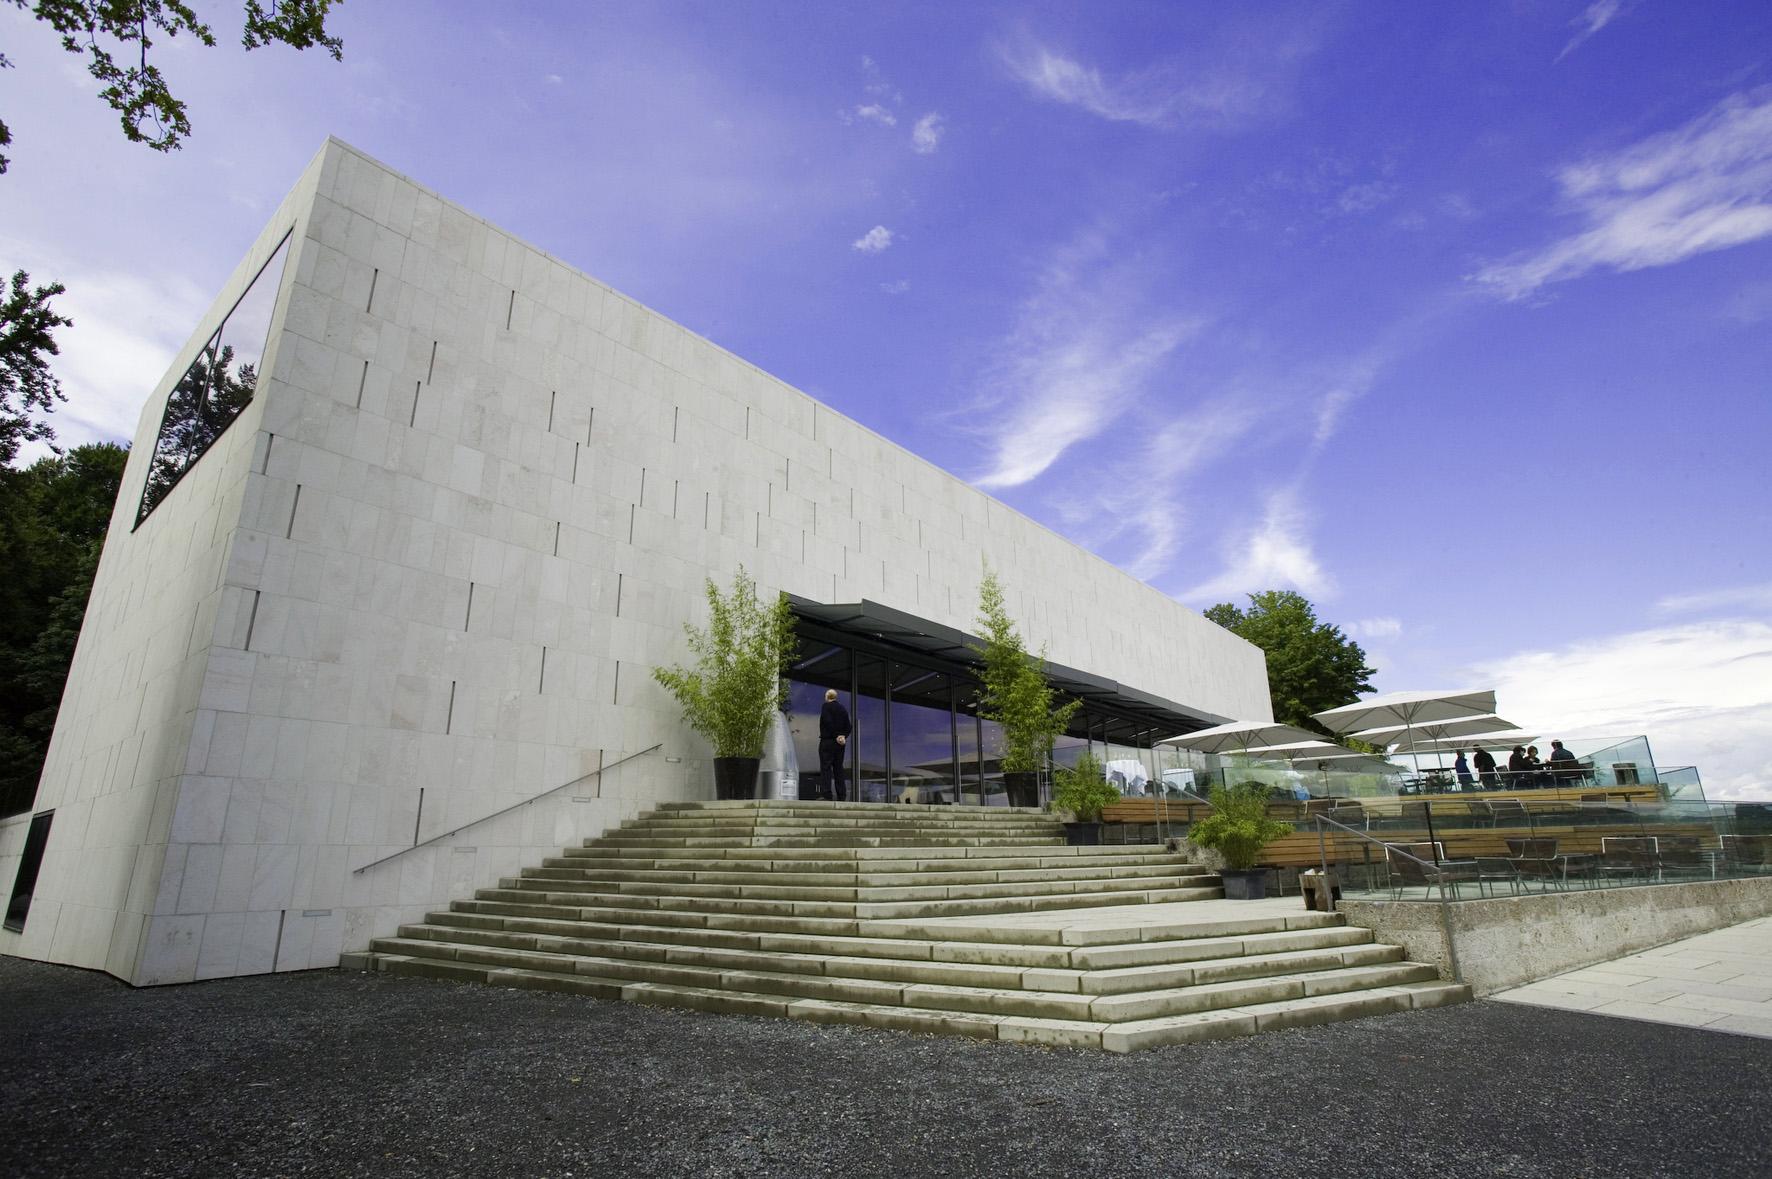 salzburg-muzeum-moderne-na-mnnchsbergu-secret-world